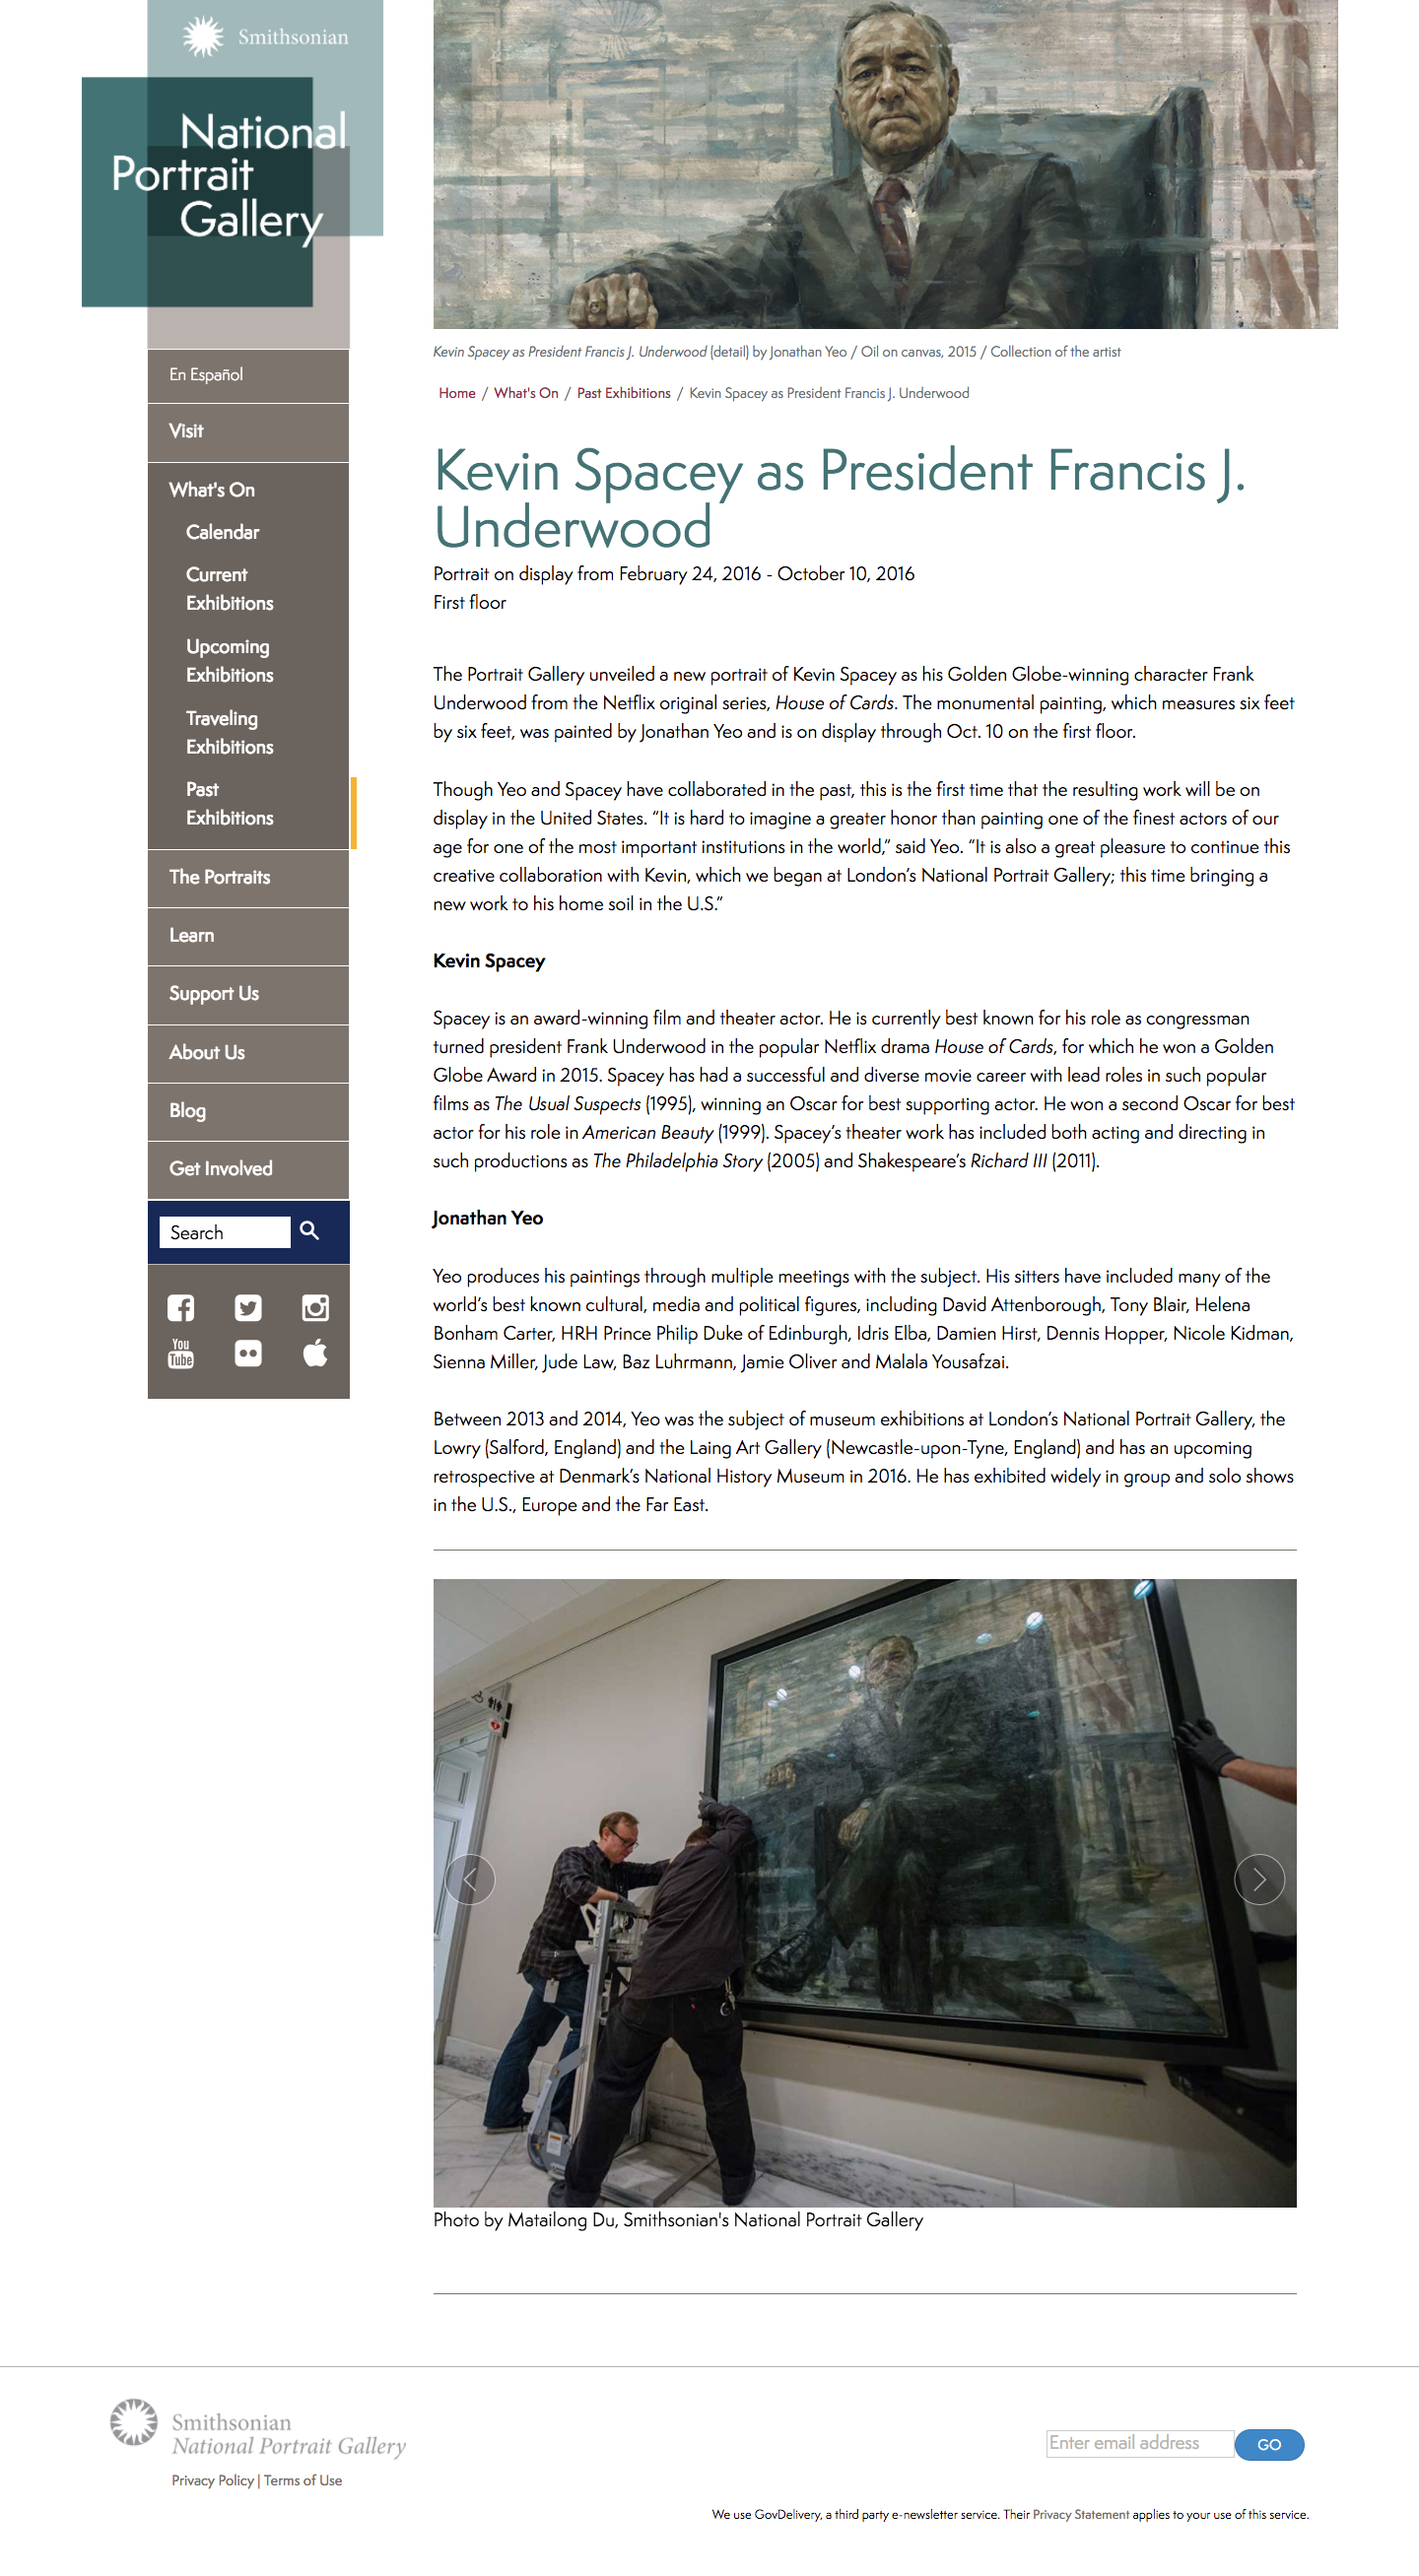 FireShot Capture 1 - Kevin Spacey as President Francis J. U_ - http___npg.si.edu_exhibition_kevin-.png